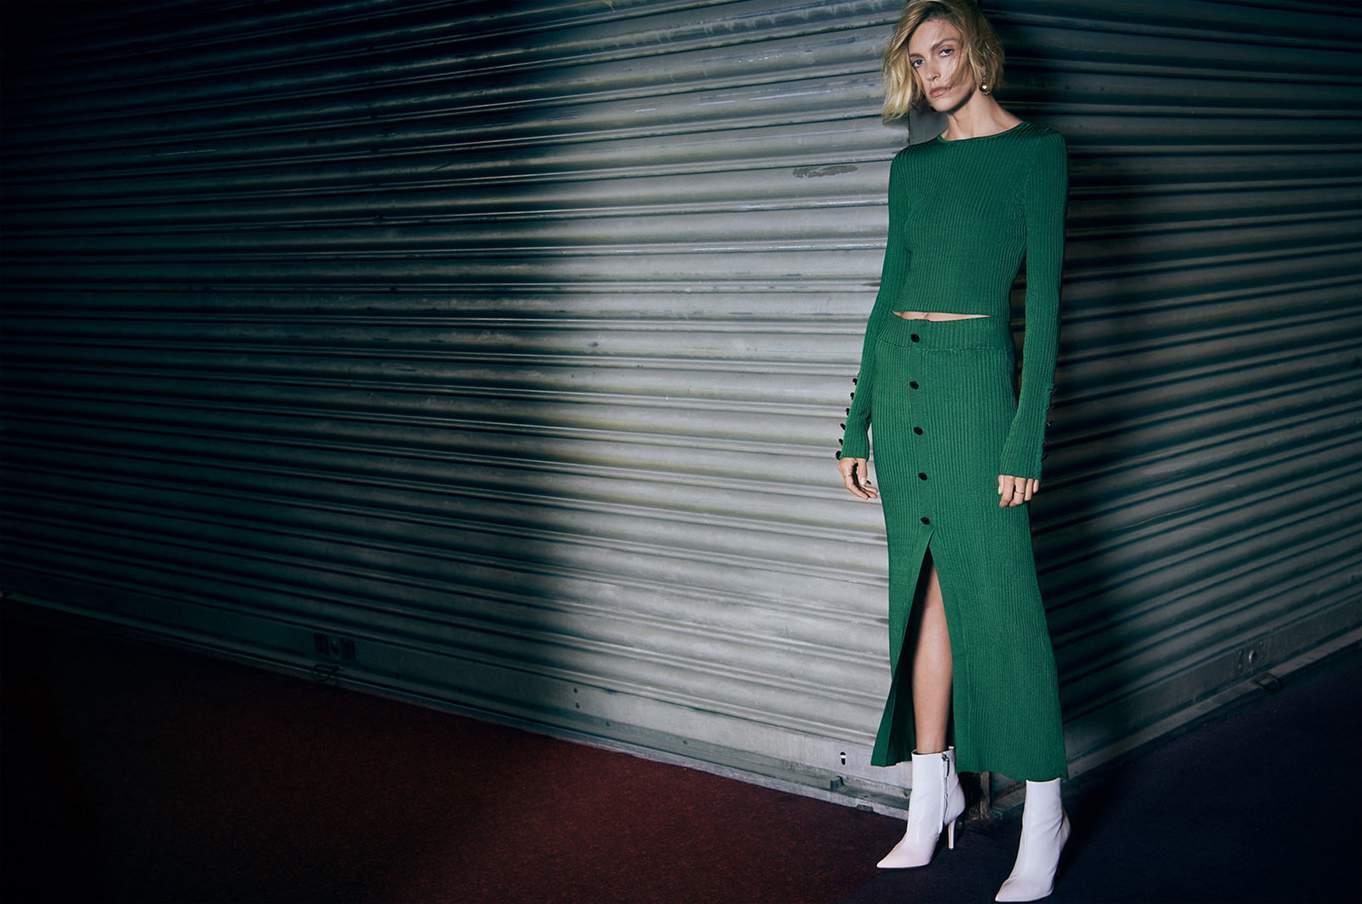 La estrategia publicitaria de Zara